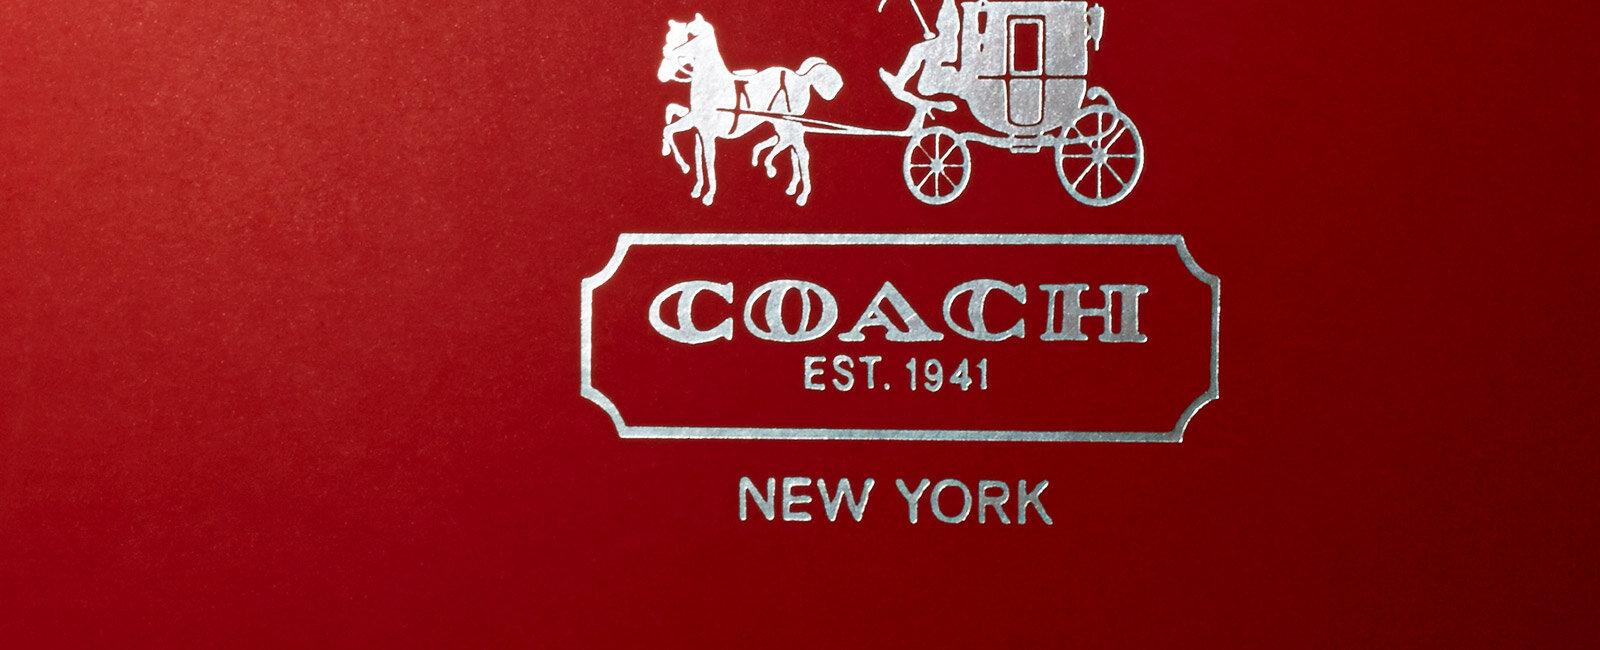 Coach-Box-Holiday-Design-Packaging-Company-2.2.jpg